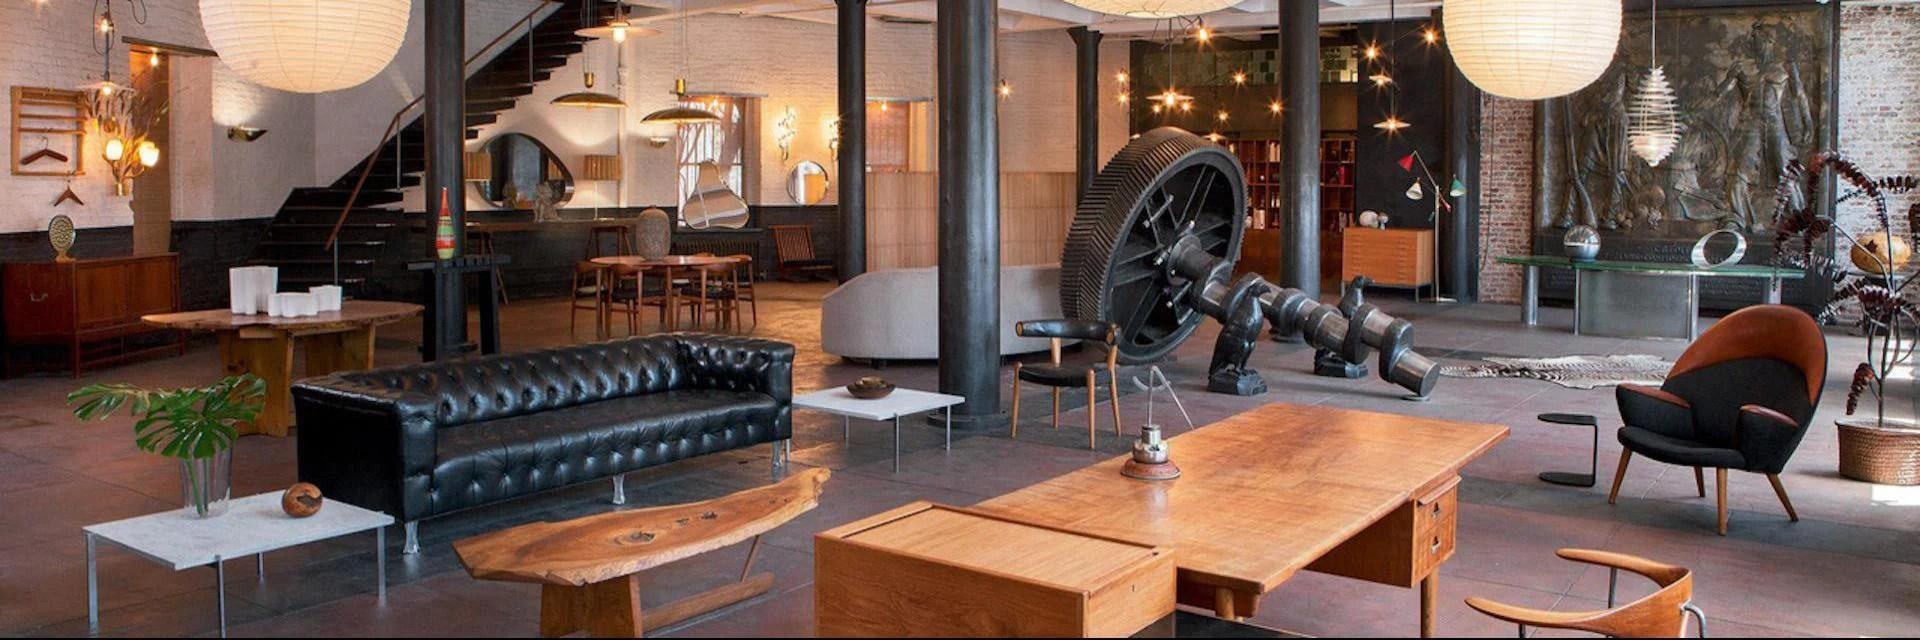 sectional sofas nyc showroom holly hunt mesa sofa dimensions wyeth mid century modern furniture home decor the hamptons new york